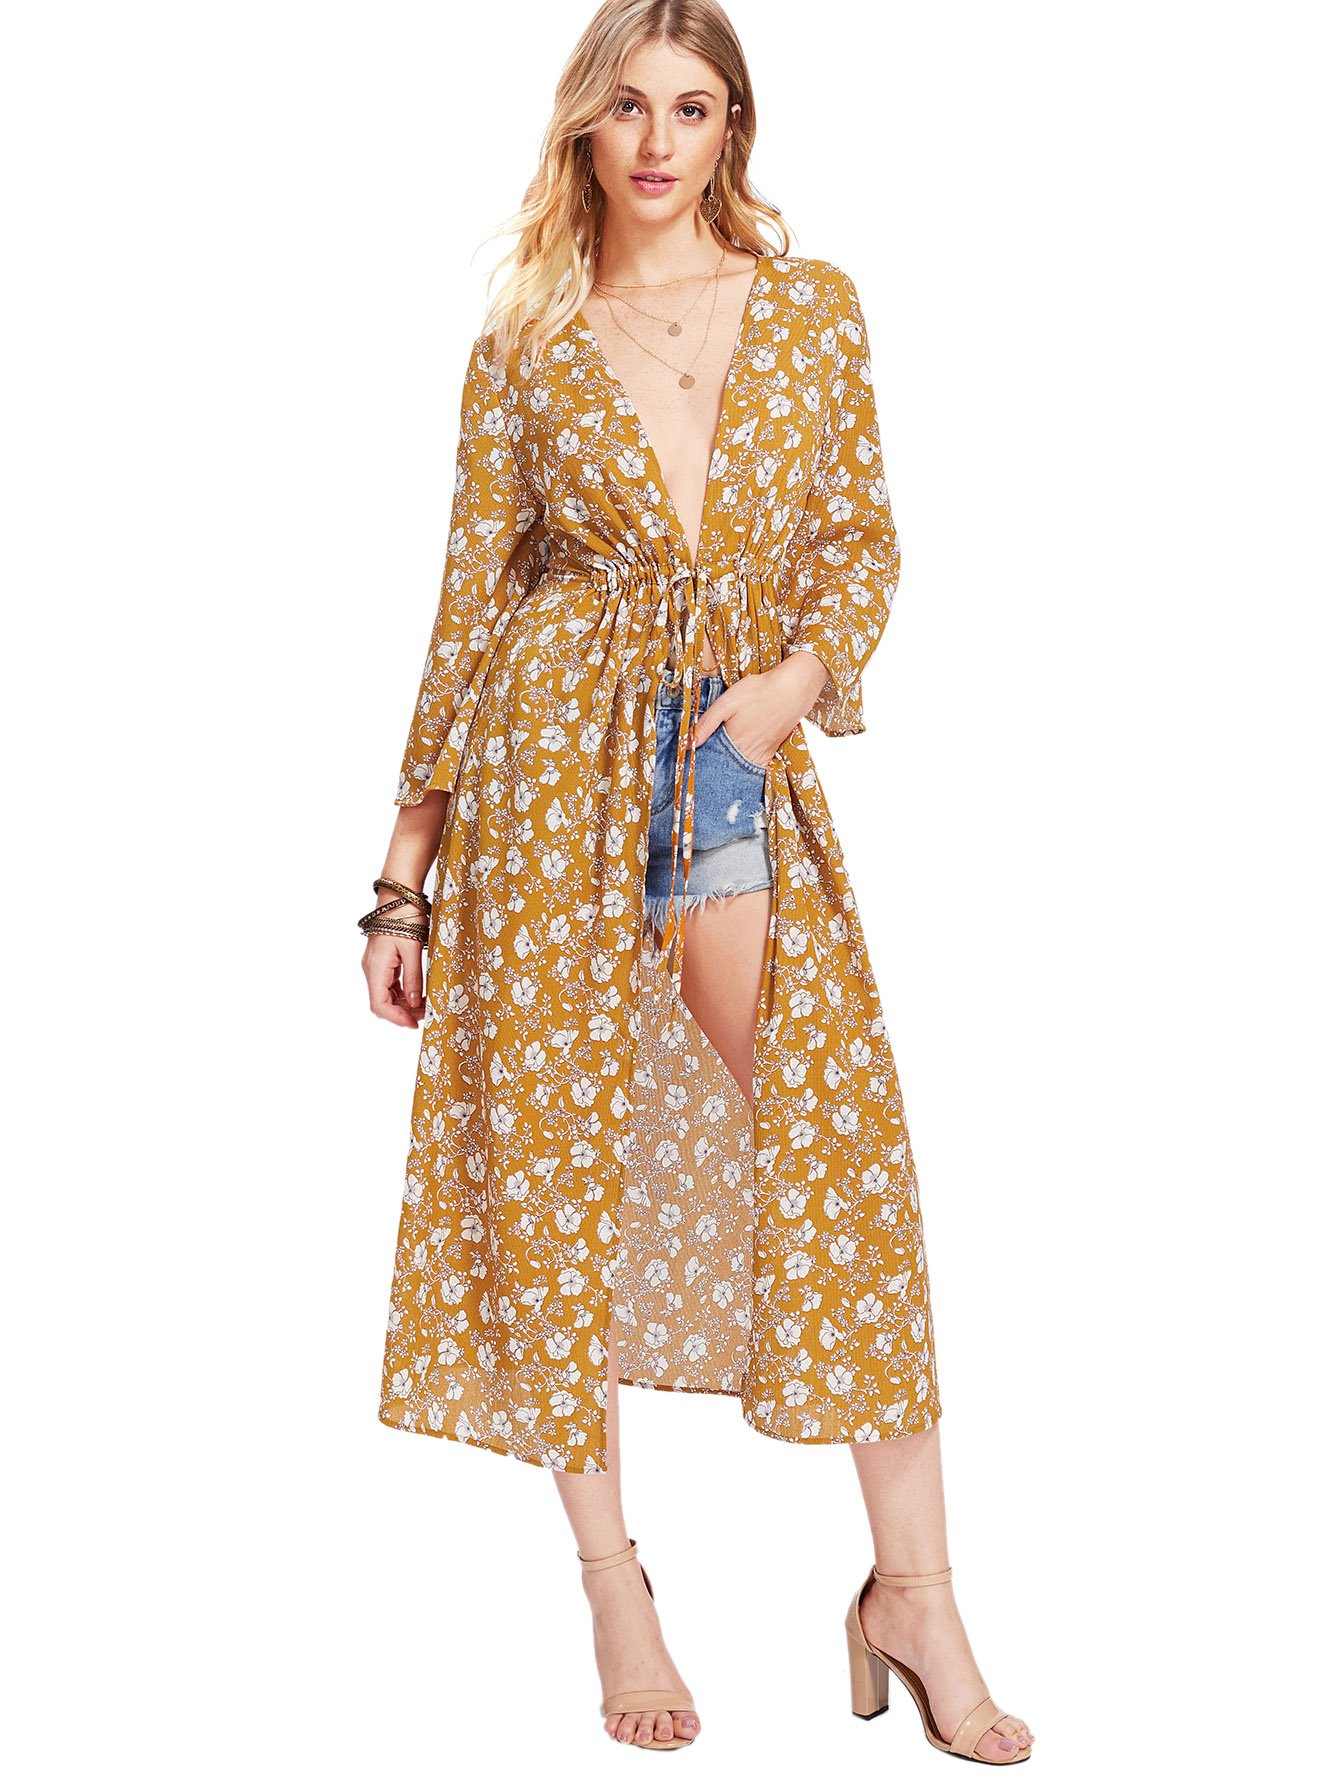 SweatyRocks Women's Beach Cover Up Swimsuit Loose Floral Print Kimono Cardigan Capes Chiffon Chiffon Blouse Multicolor L